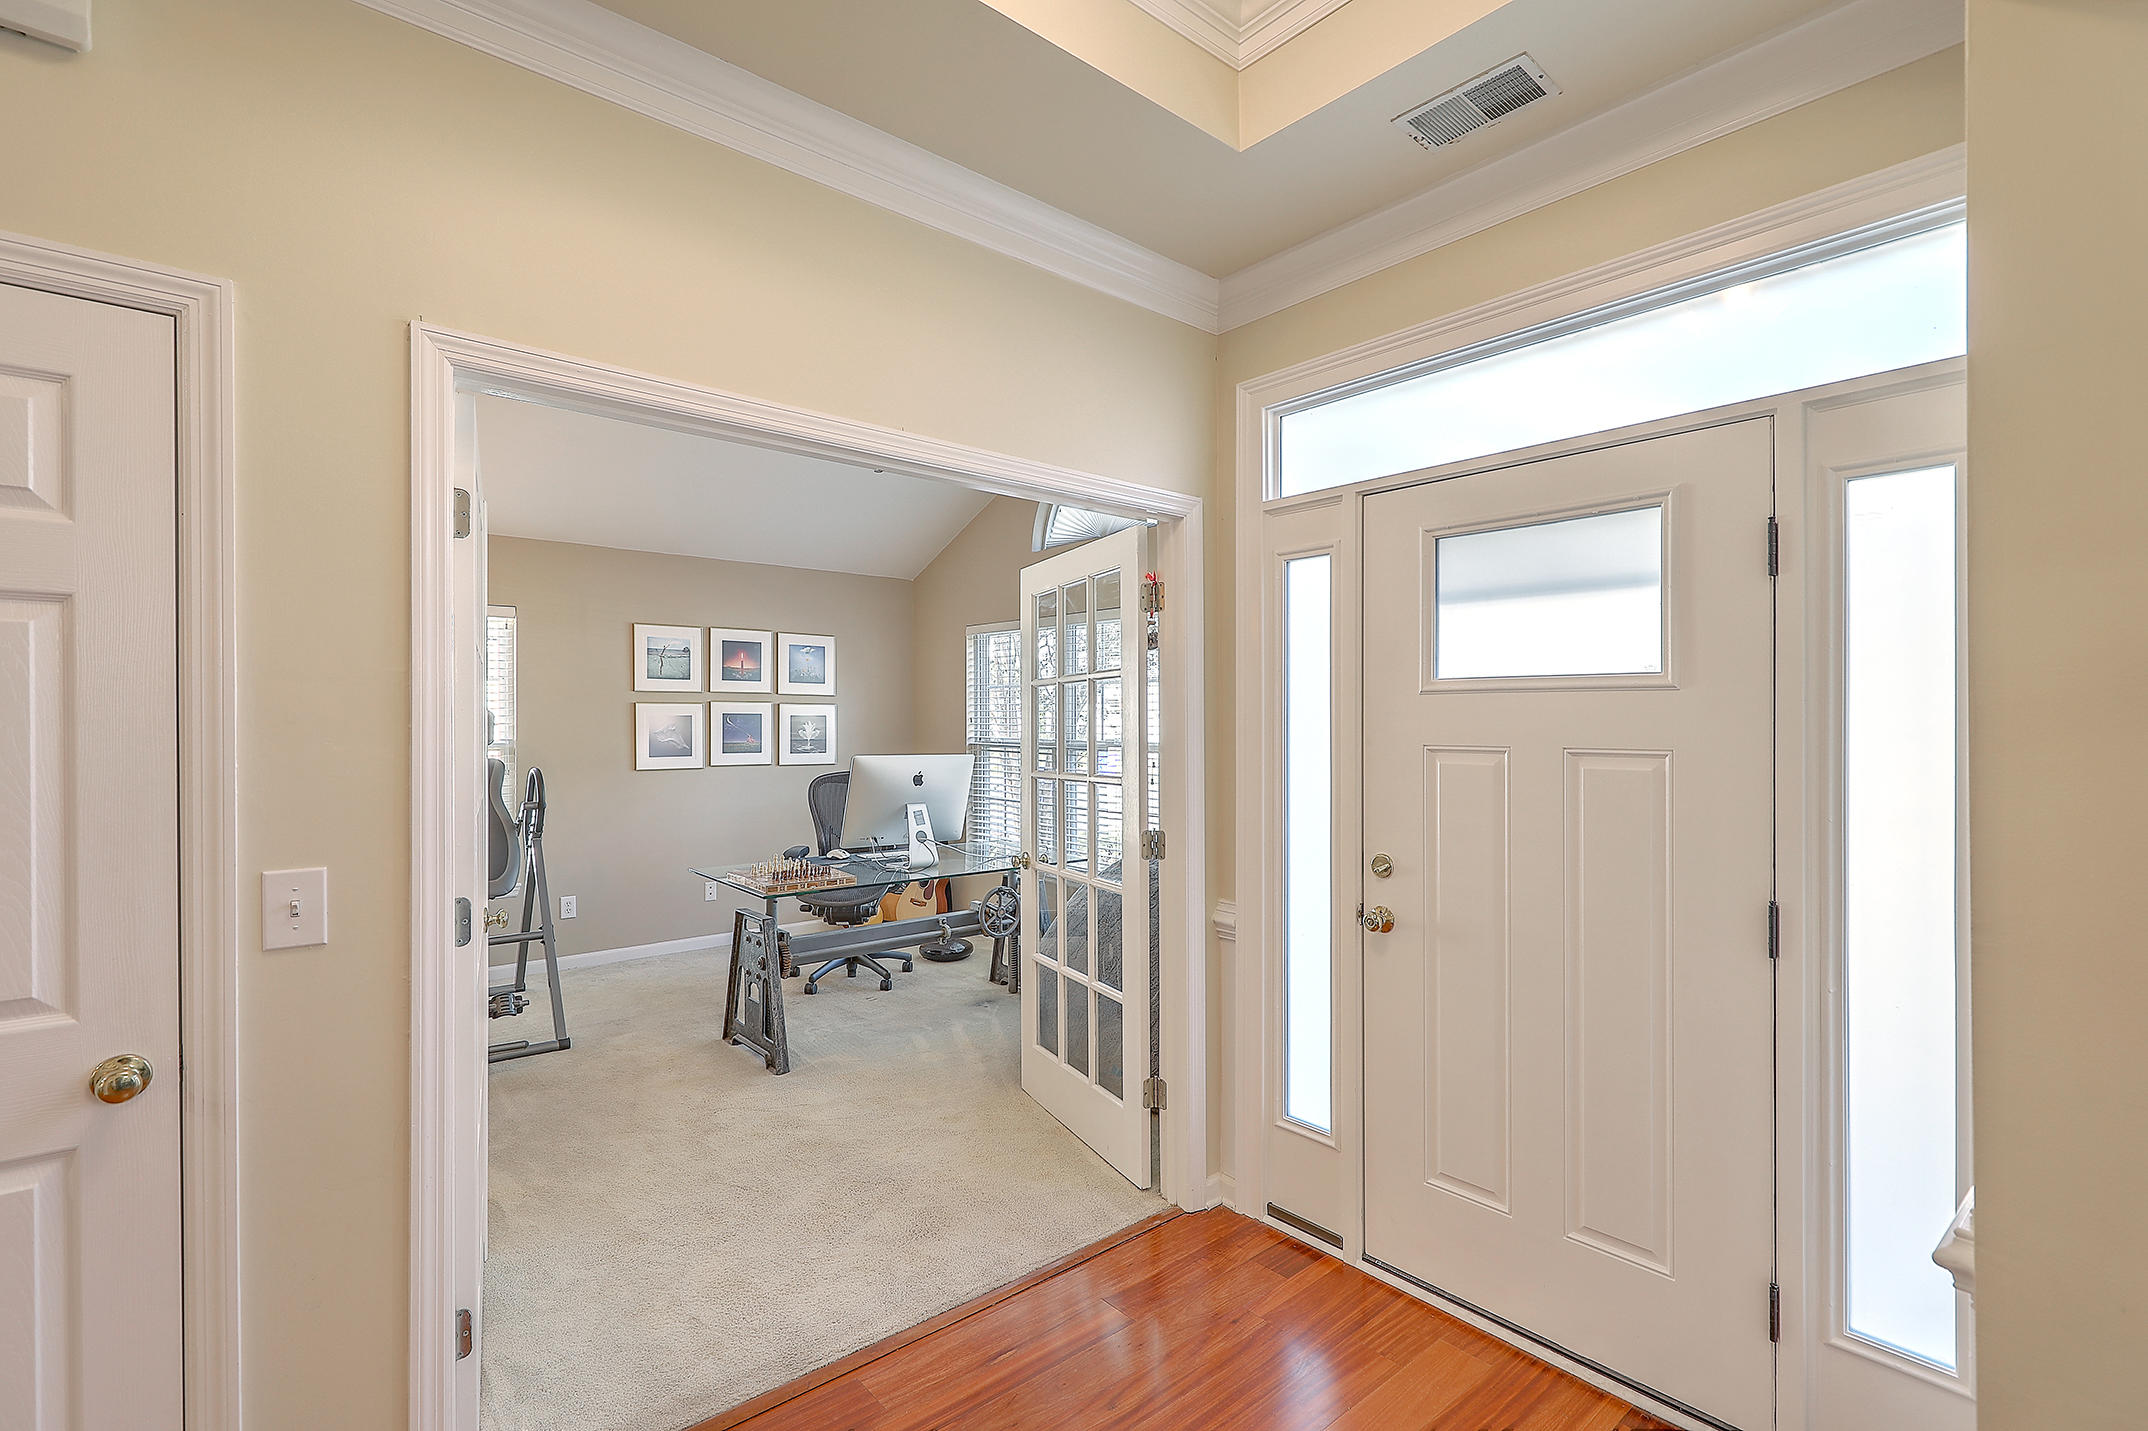 Dunes West Homes For Sale - 1471 Cypress Pointe, Mount Pleasant, SC - 8